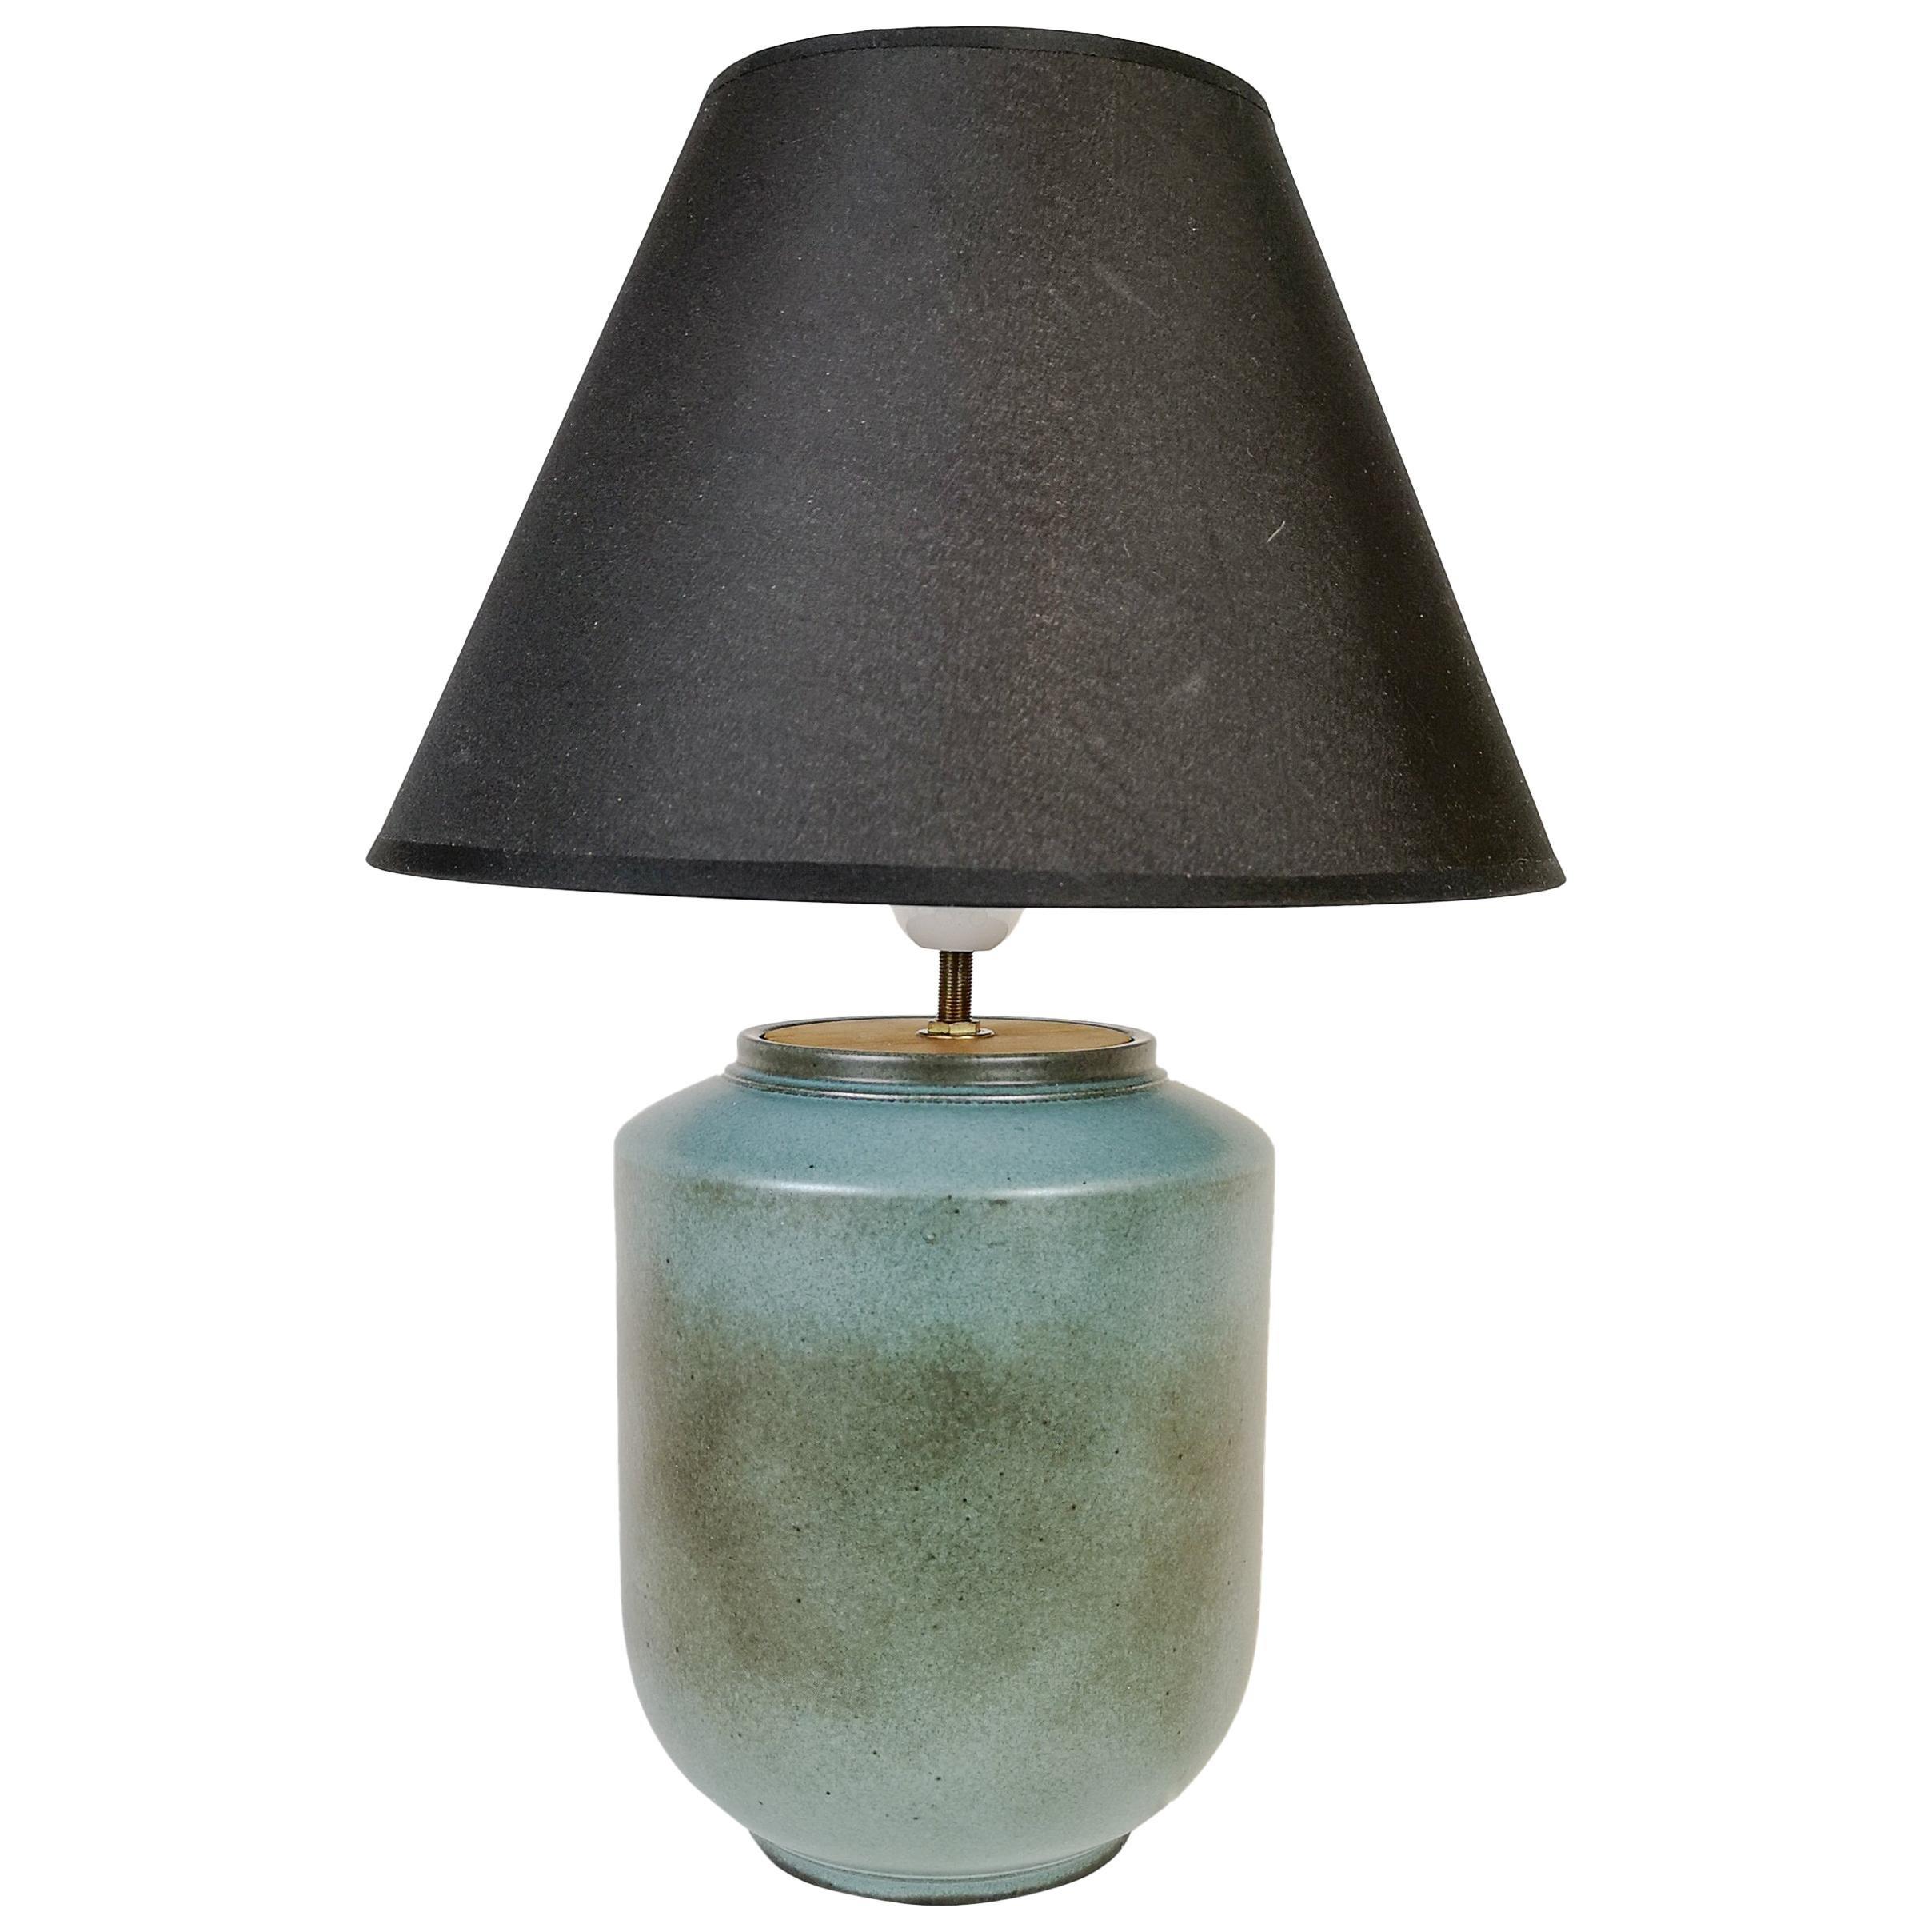 Ceramic Swedish Midcentury Table Lamp by Gunnar Nylund Rörstrand